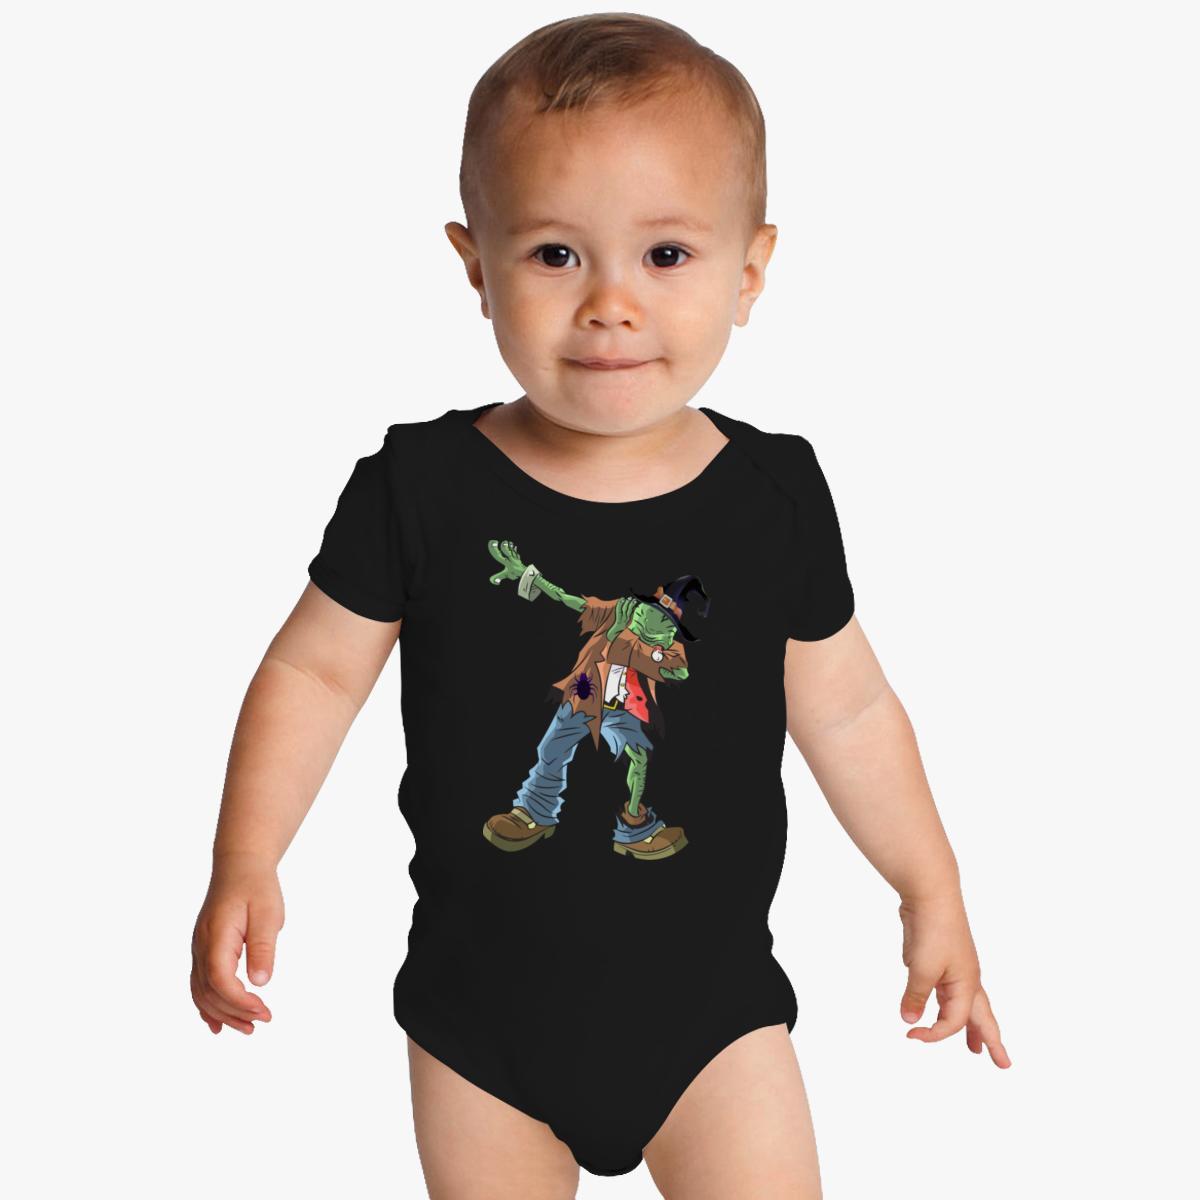 84f1c97d0 Halloween Costume For Baby Boy - www.naturallycurlye.com